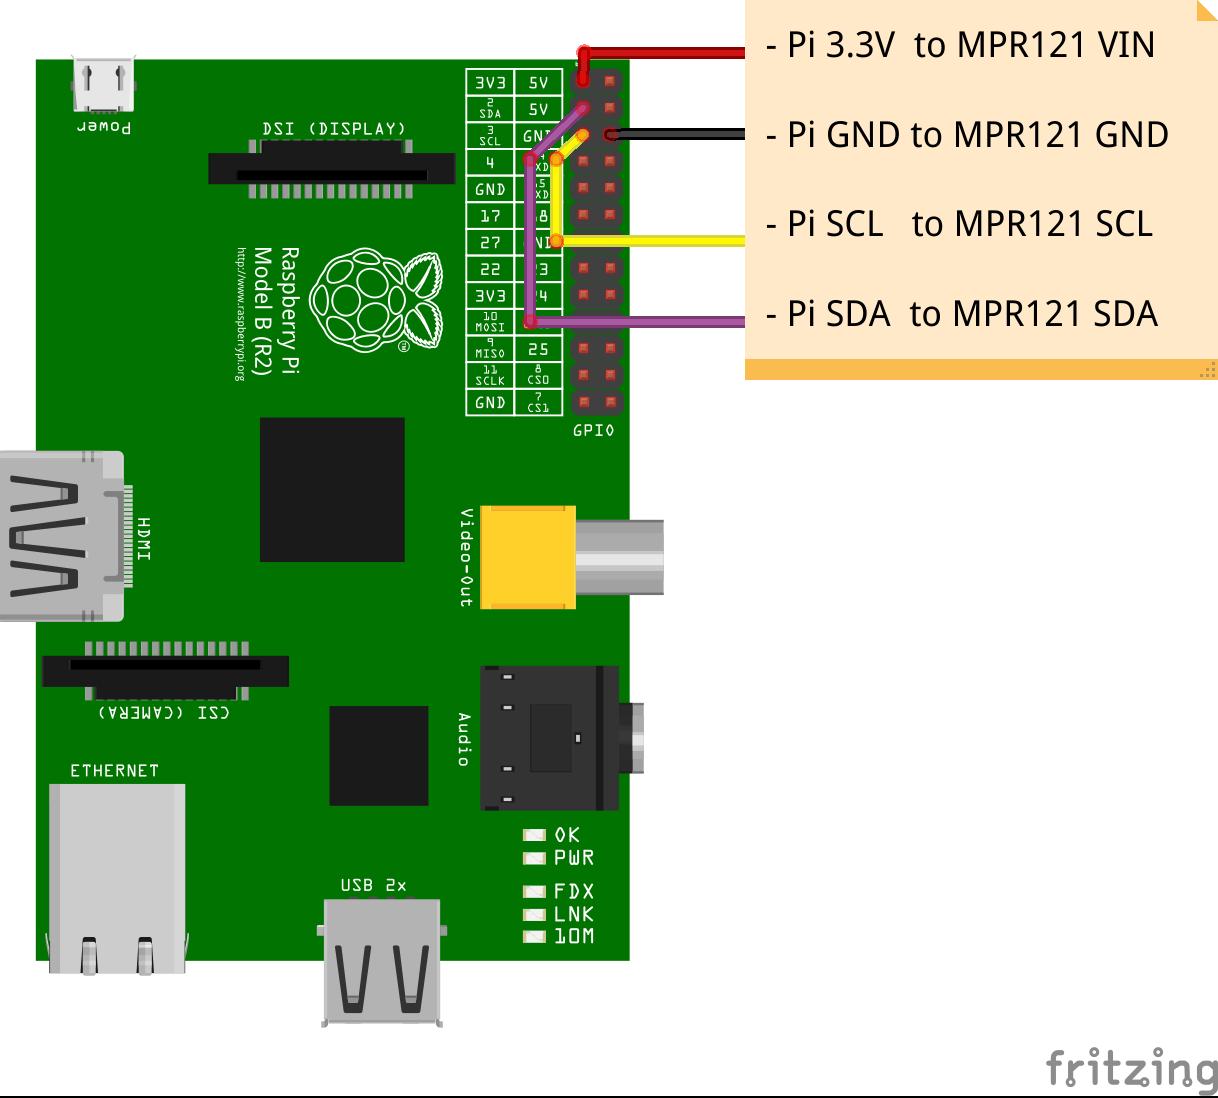 sensors_MPR121_RaspberryPi_bb.png